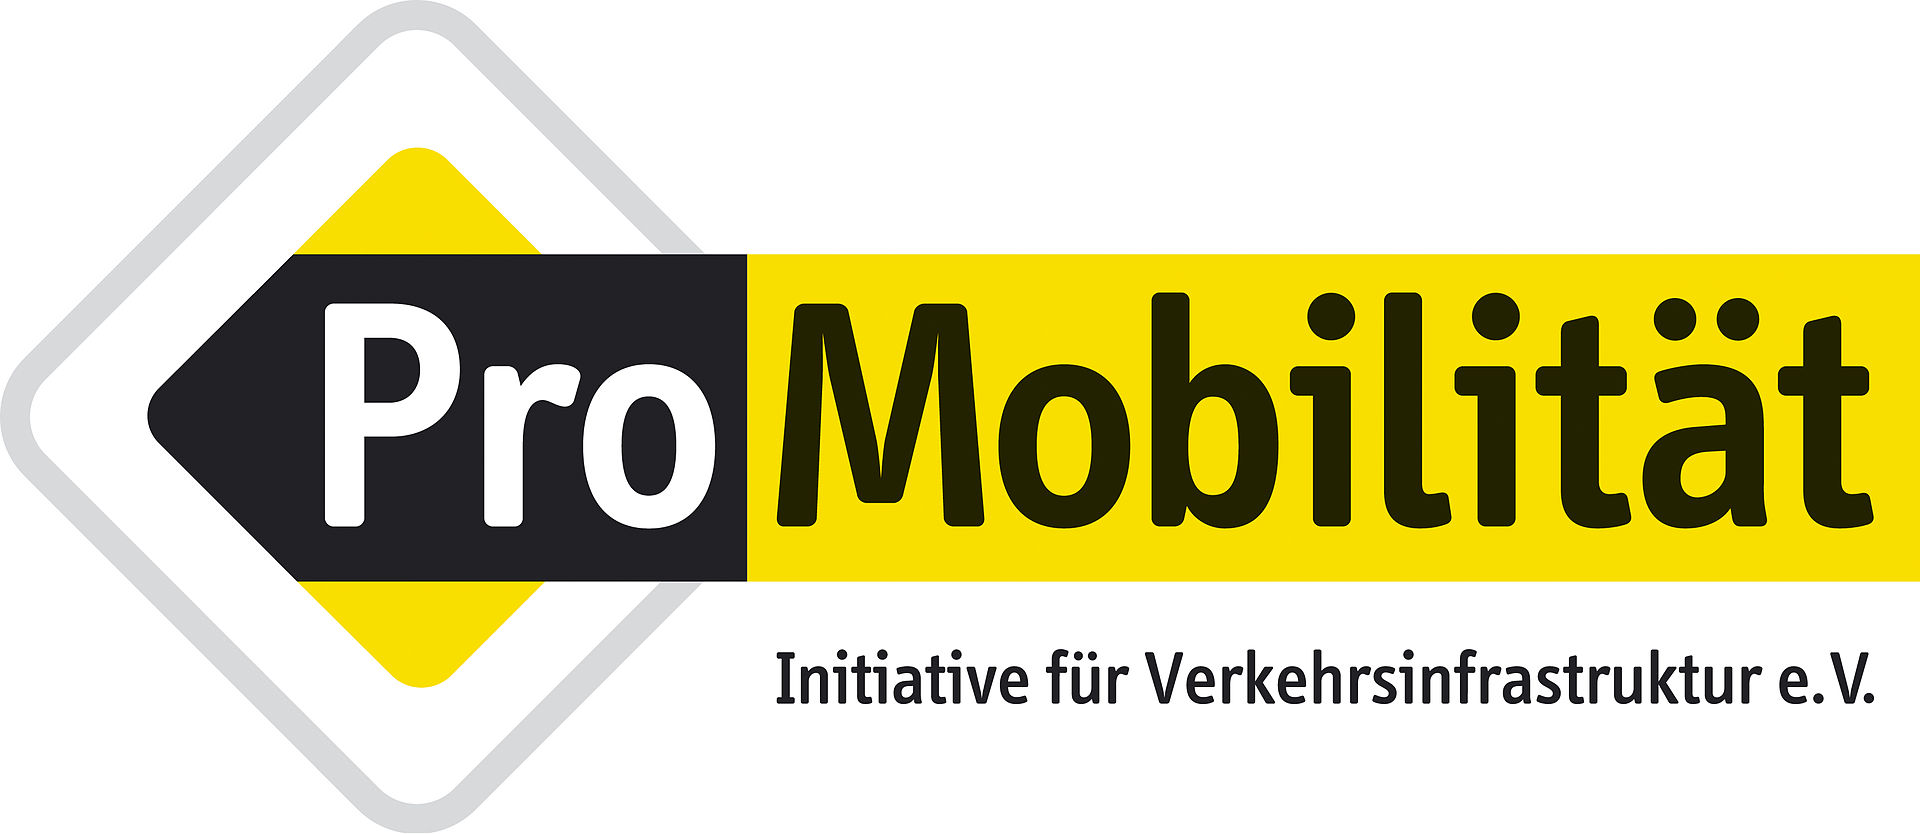 Pro Mobilität - Initiative für Verkehrsinfrastruktur e.V.